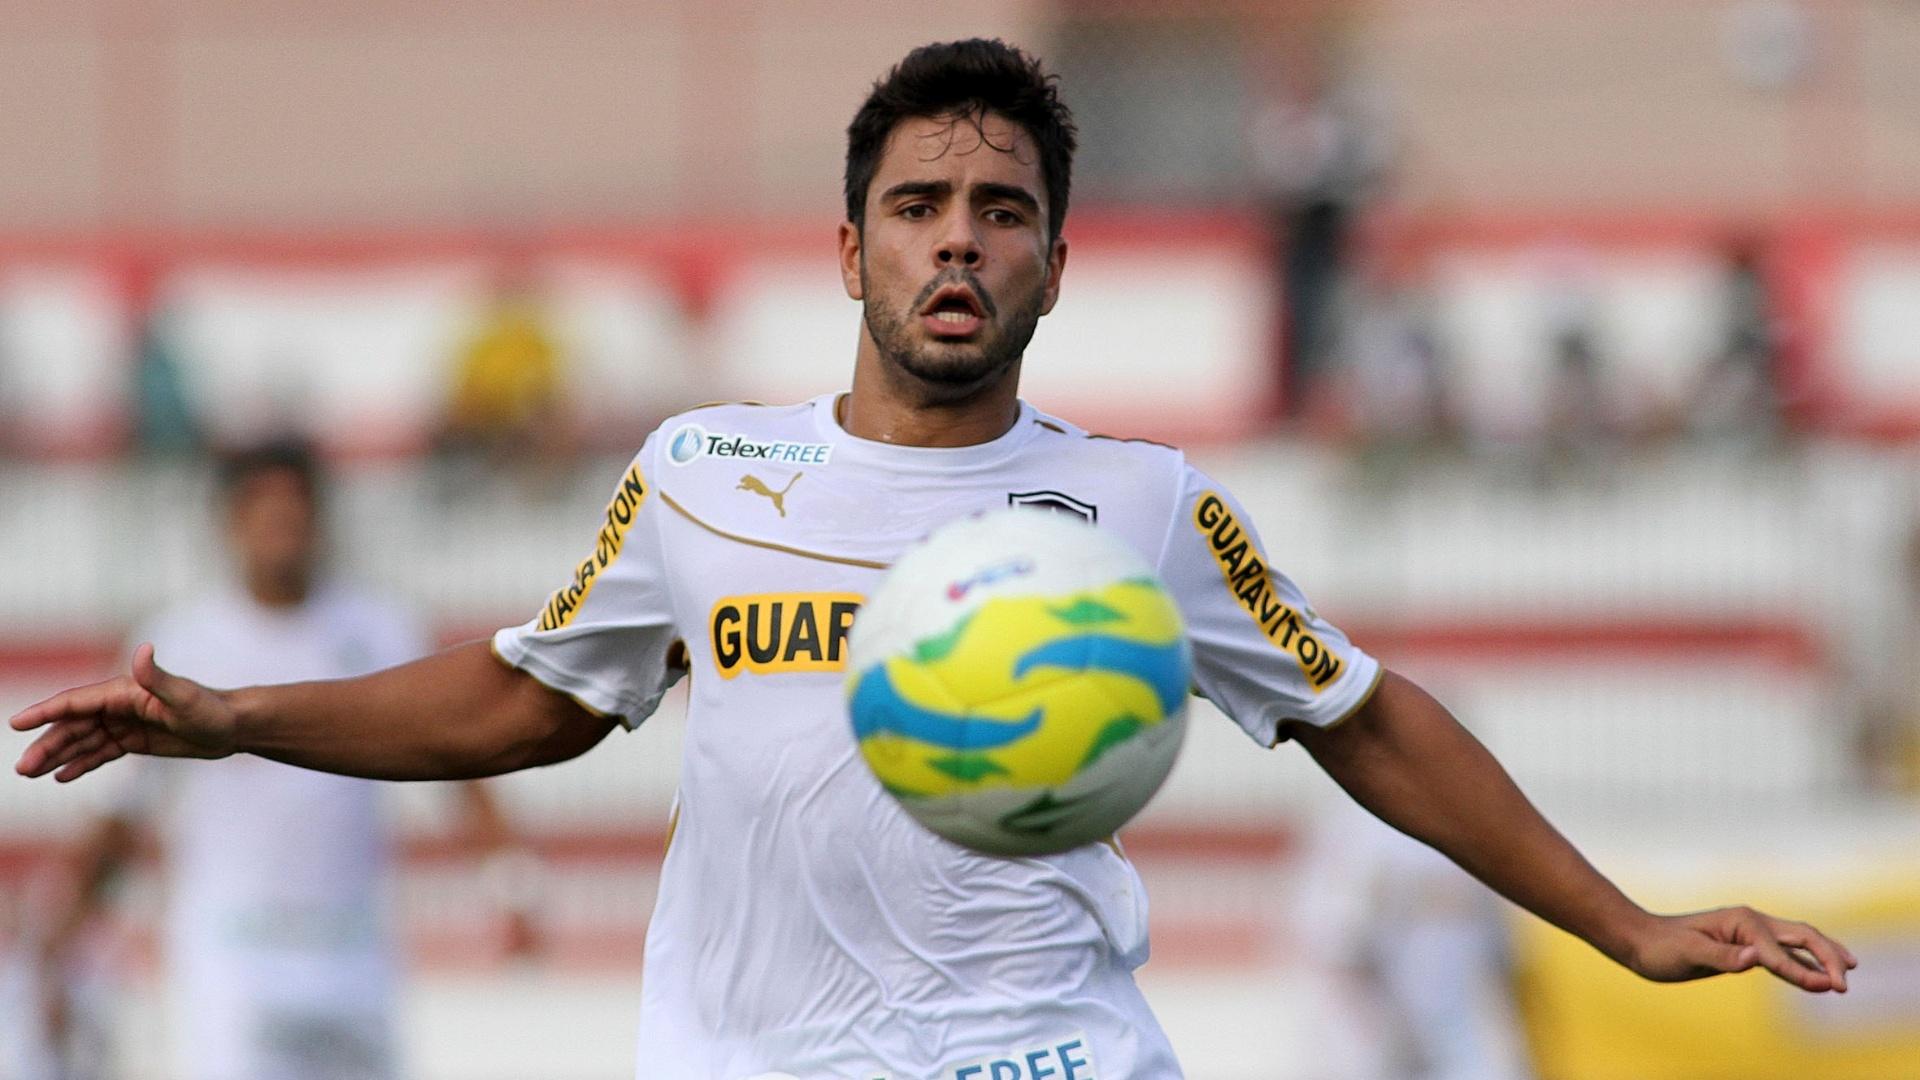 01.mar.2014 - Henrique tenta o domínio da bola na partida entre Botafogo e Macae pelo Campeonato Carioca